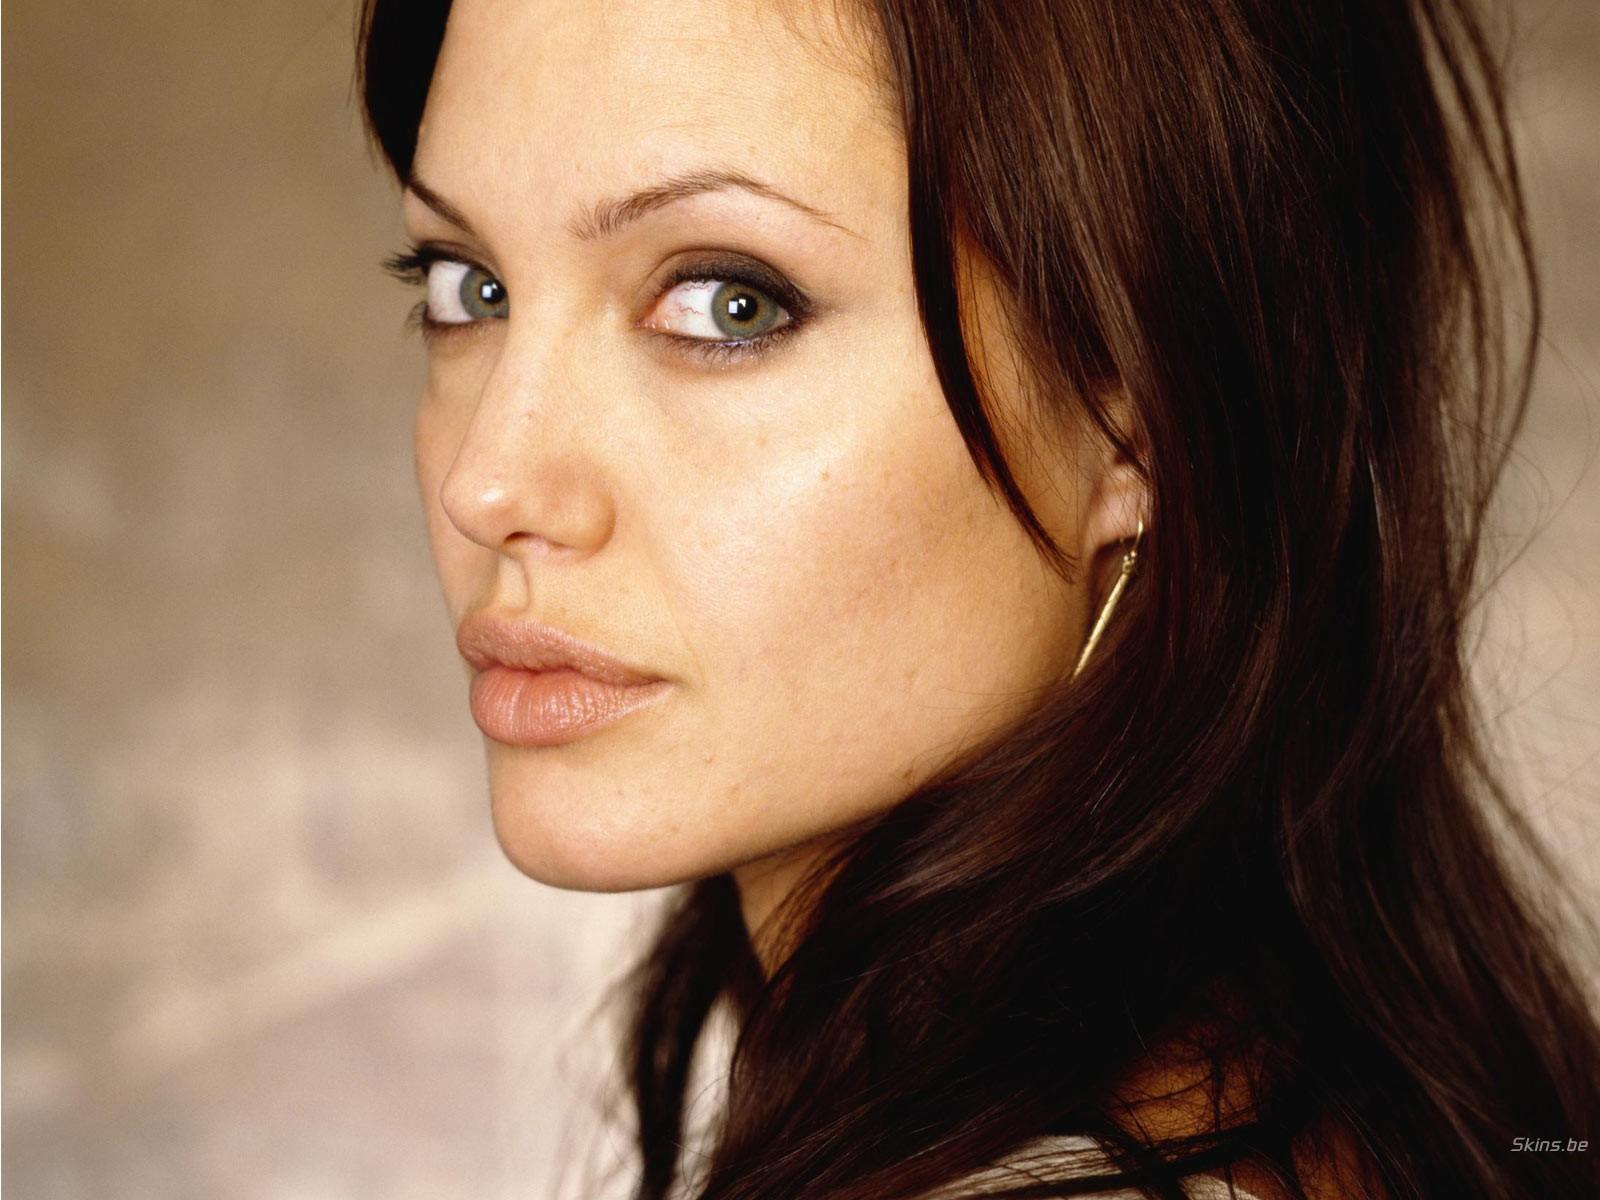 Angelina-Jolie-http-www-wallarena-com-angelina-jolie-html-wallpaper-wp6002011